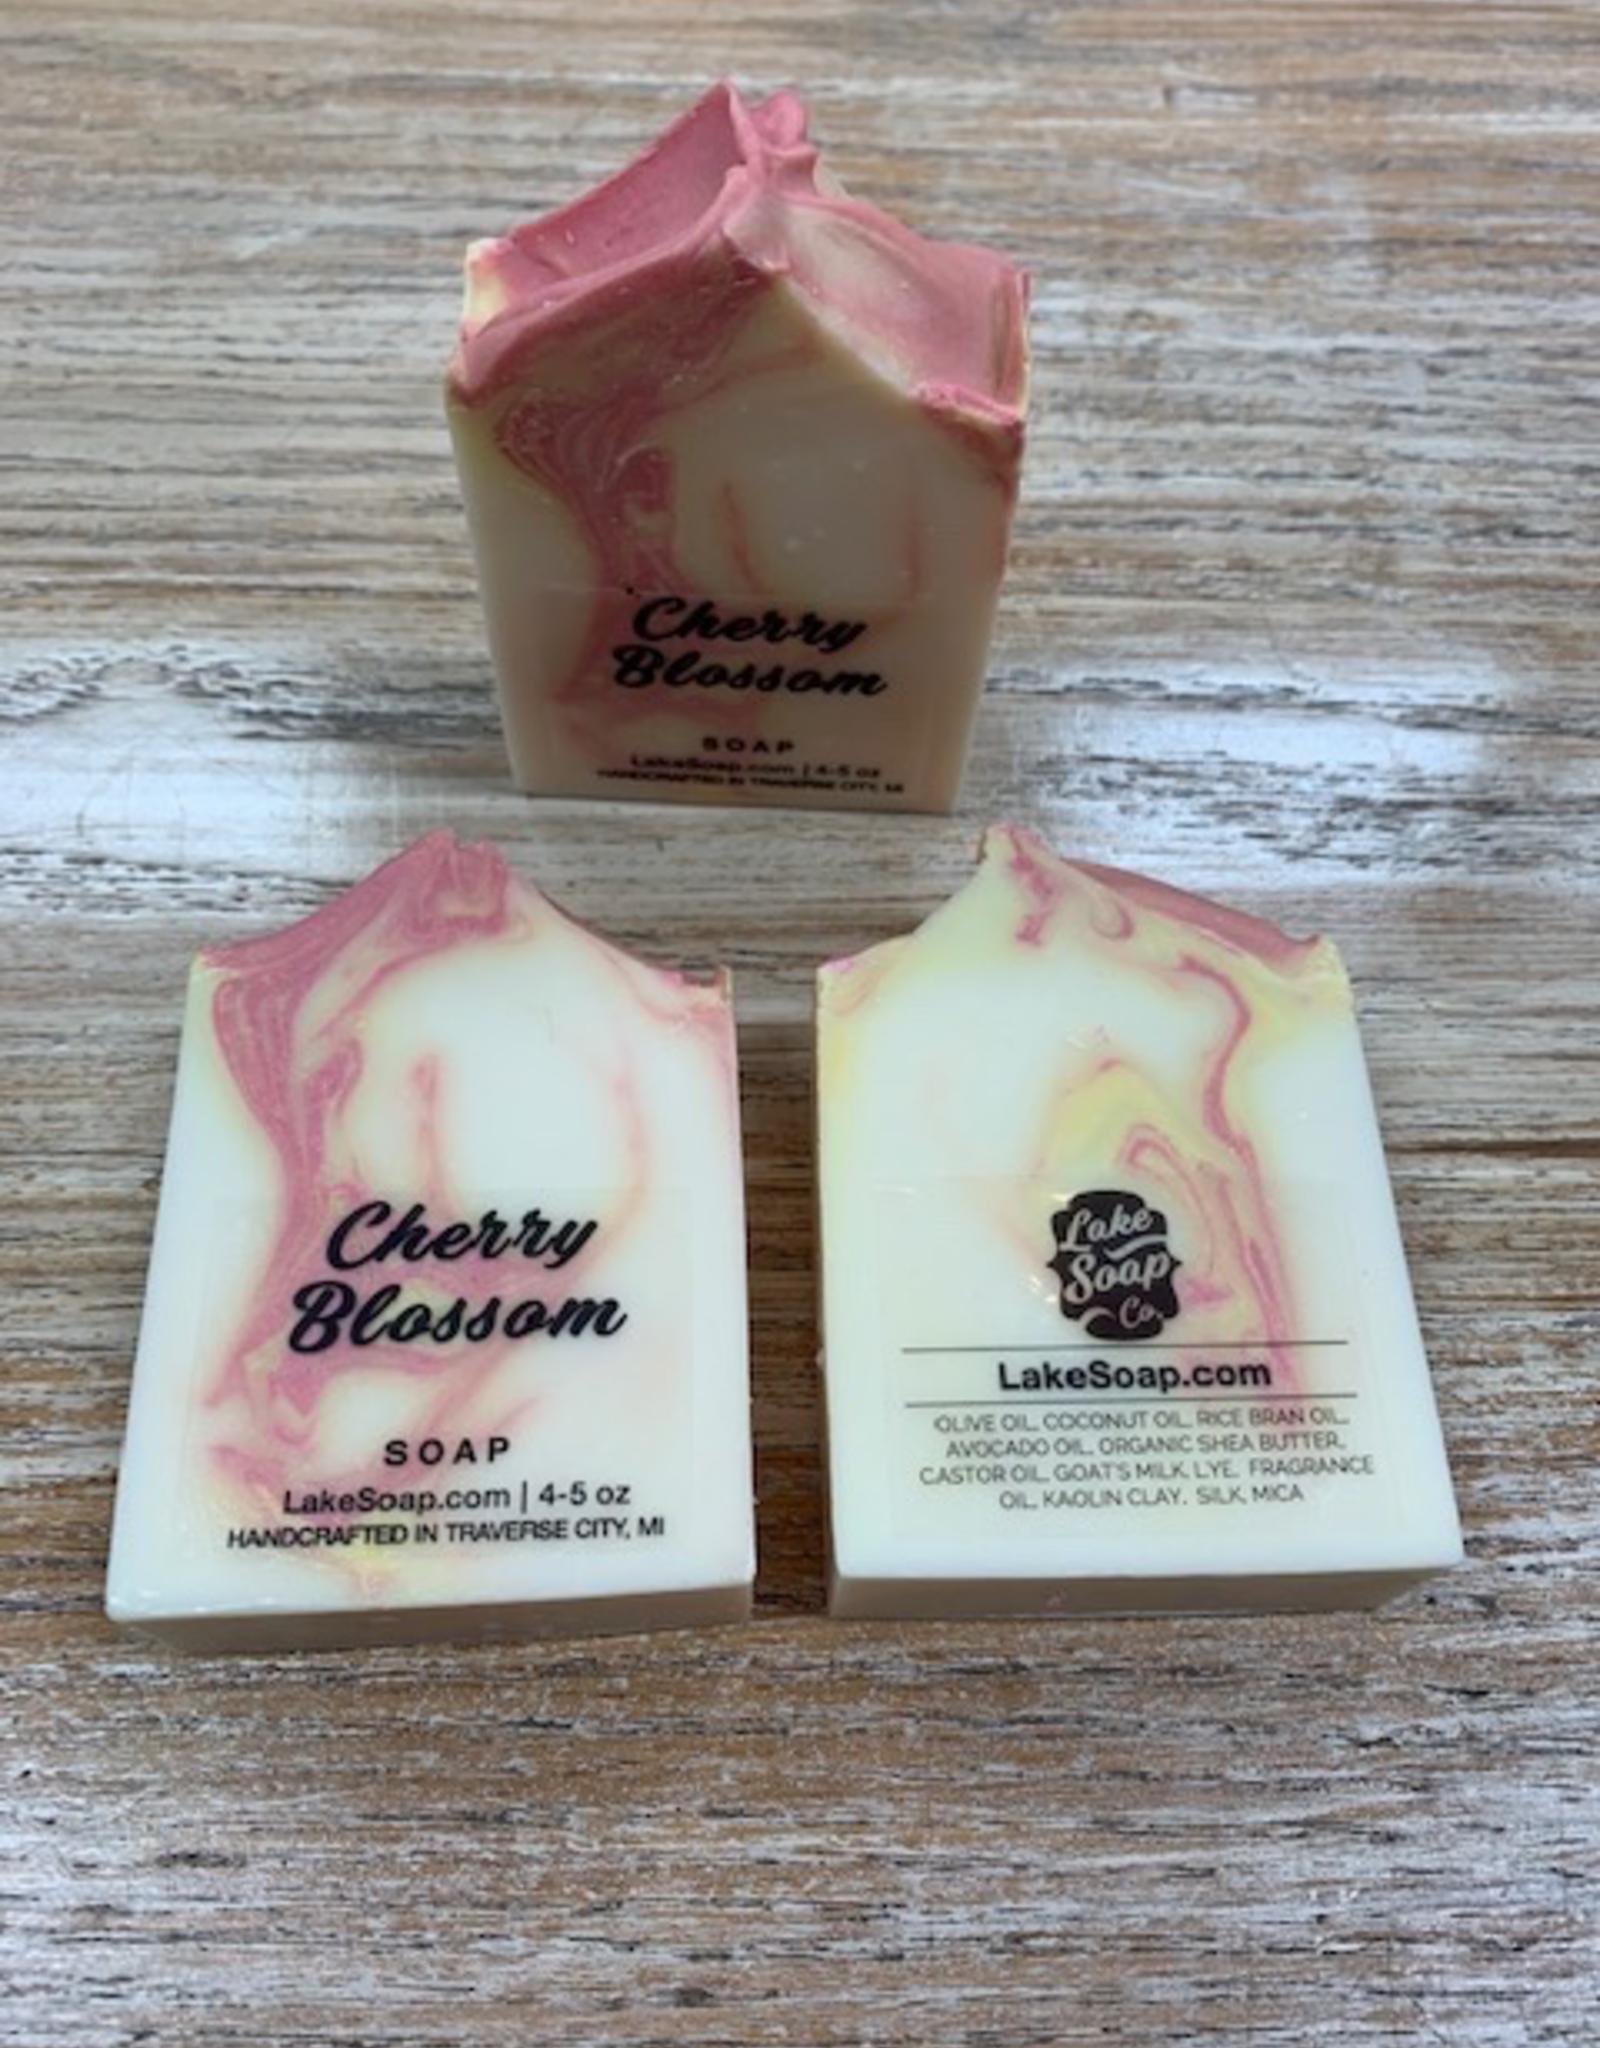 Beauty Lake Soap, Cherry Blossom